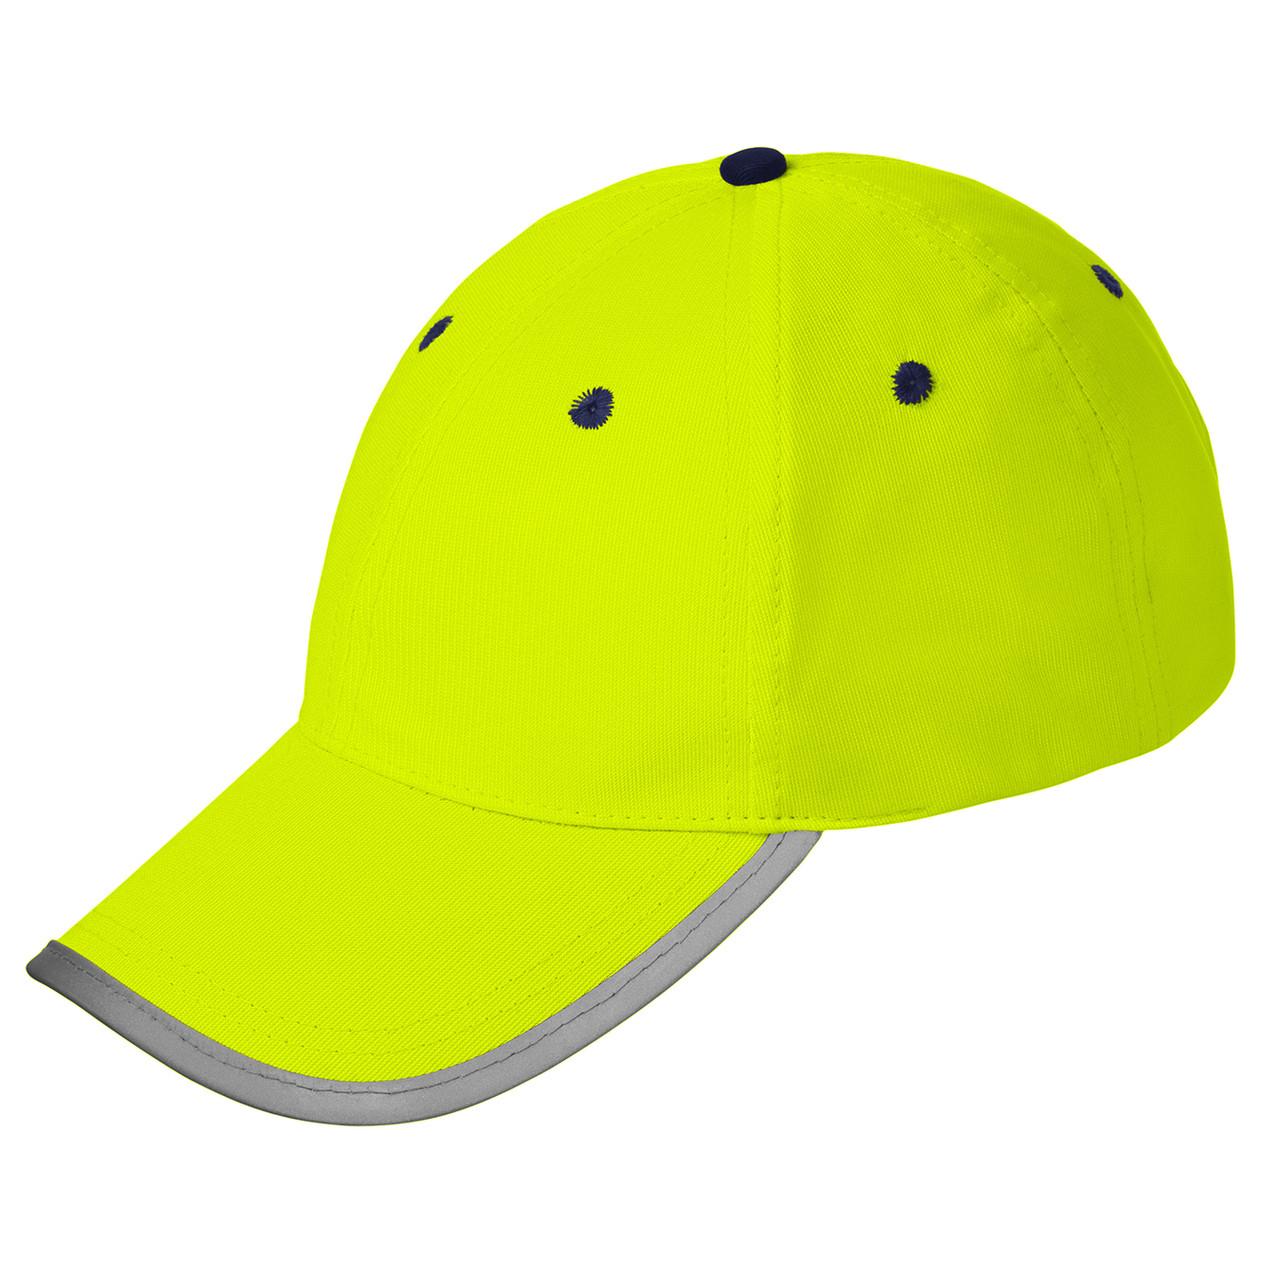 18dd4e8e30c397 148 Yellow Hi-Viz Ball Cap | Safetywear.ca